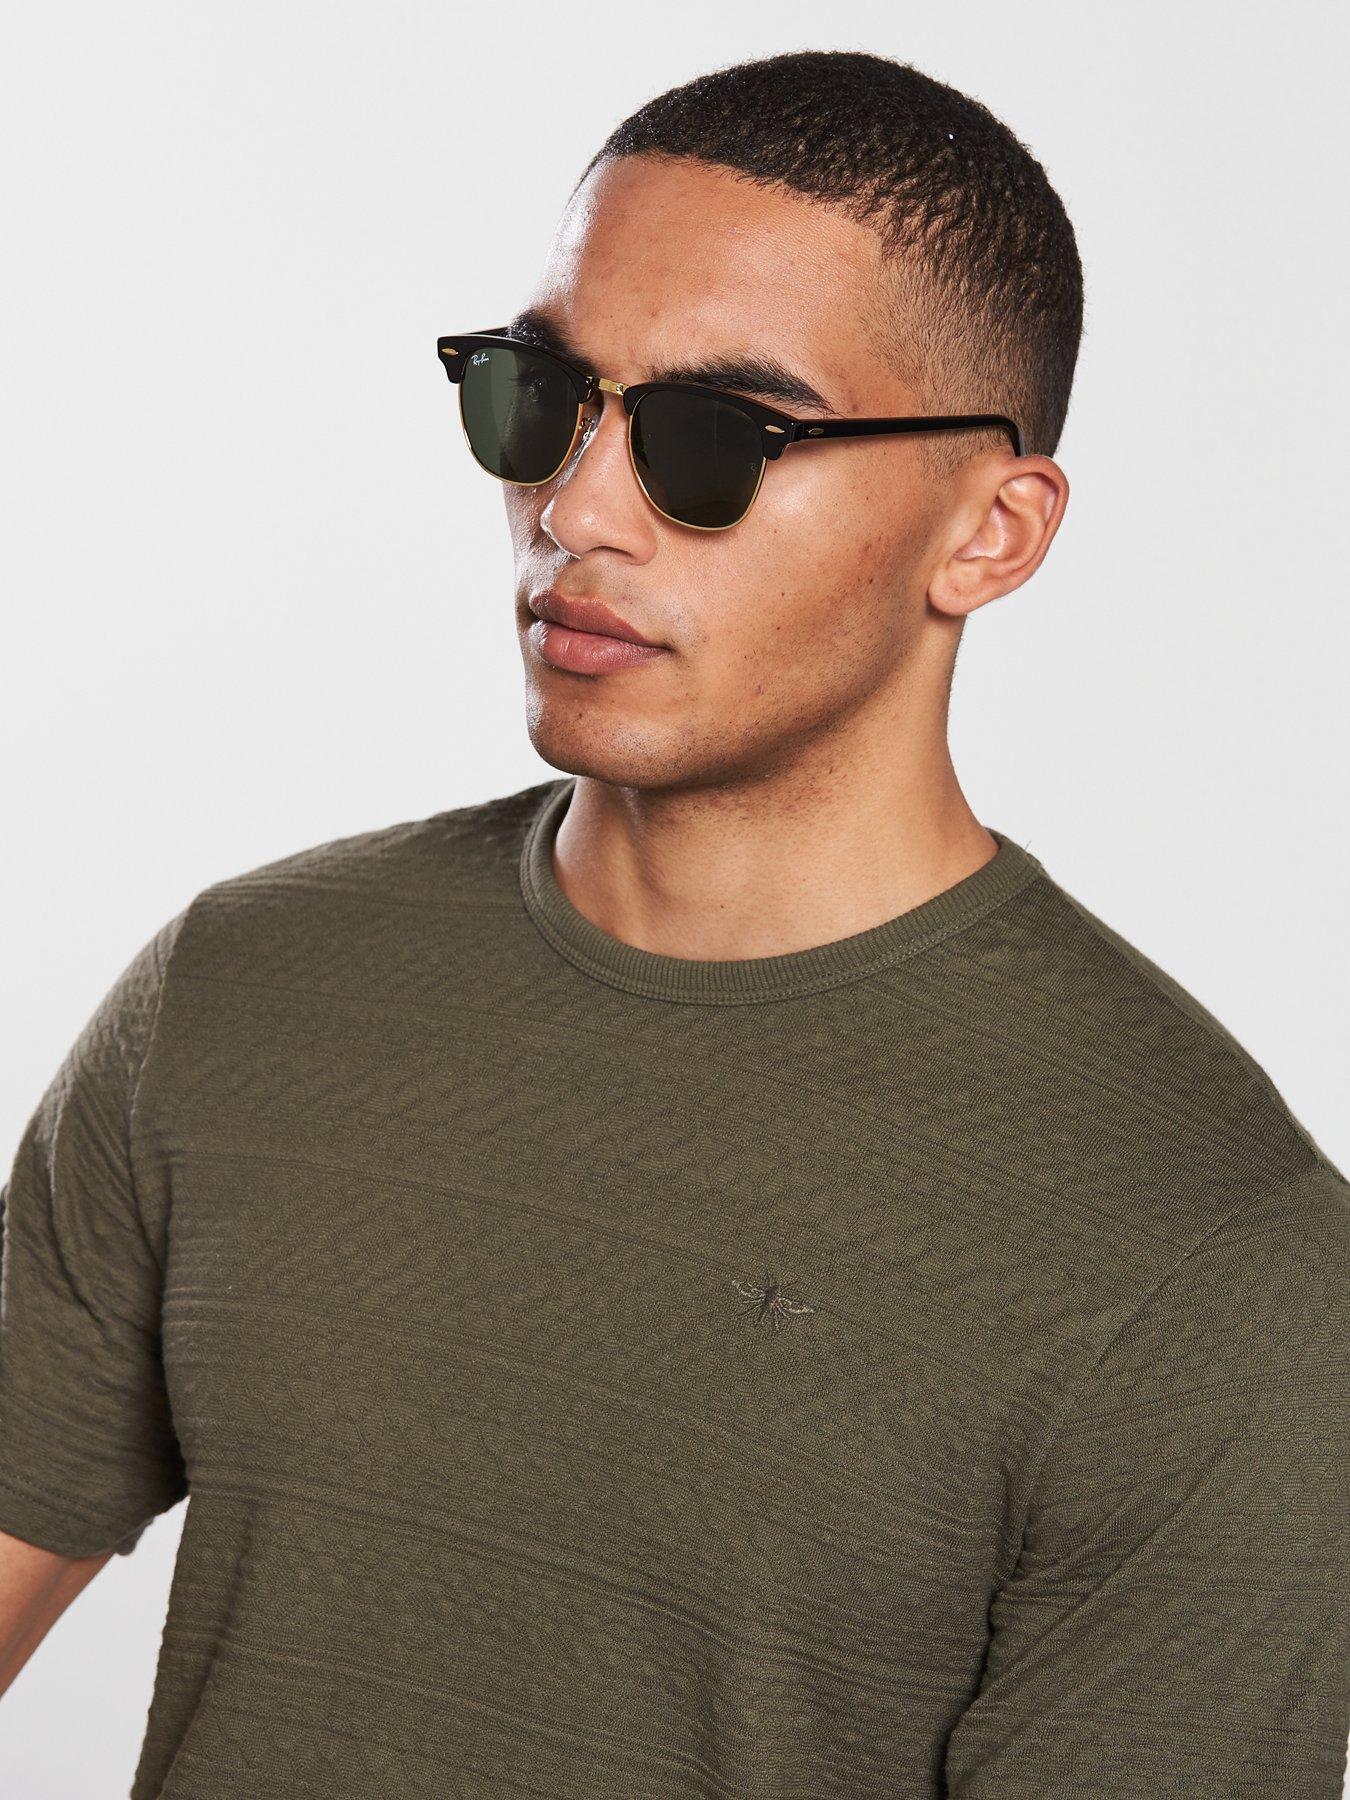 ce91a55556 italy clubmaster sunglasses rayban shopping center 68509 e9353  discount ray  ban rayban clubmaster sunglasses 4adee 5ef1e